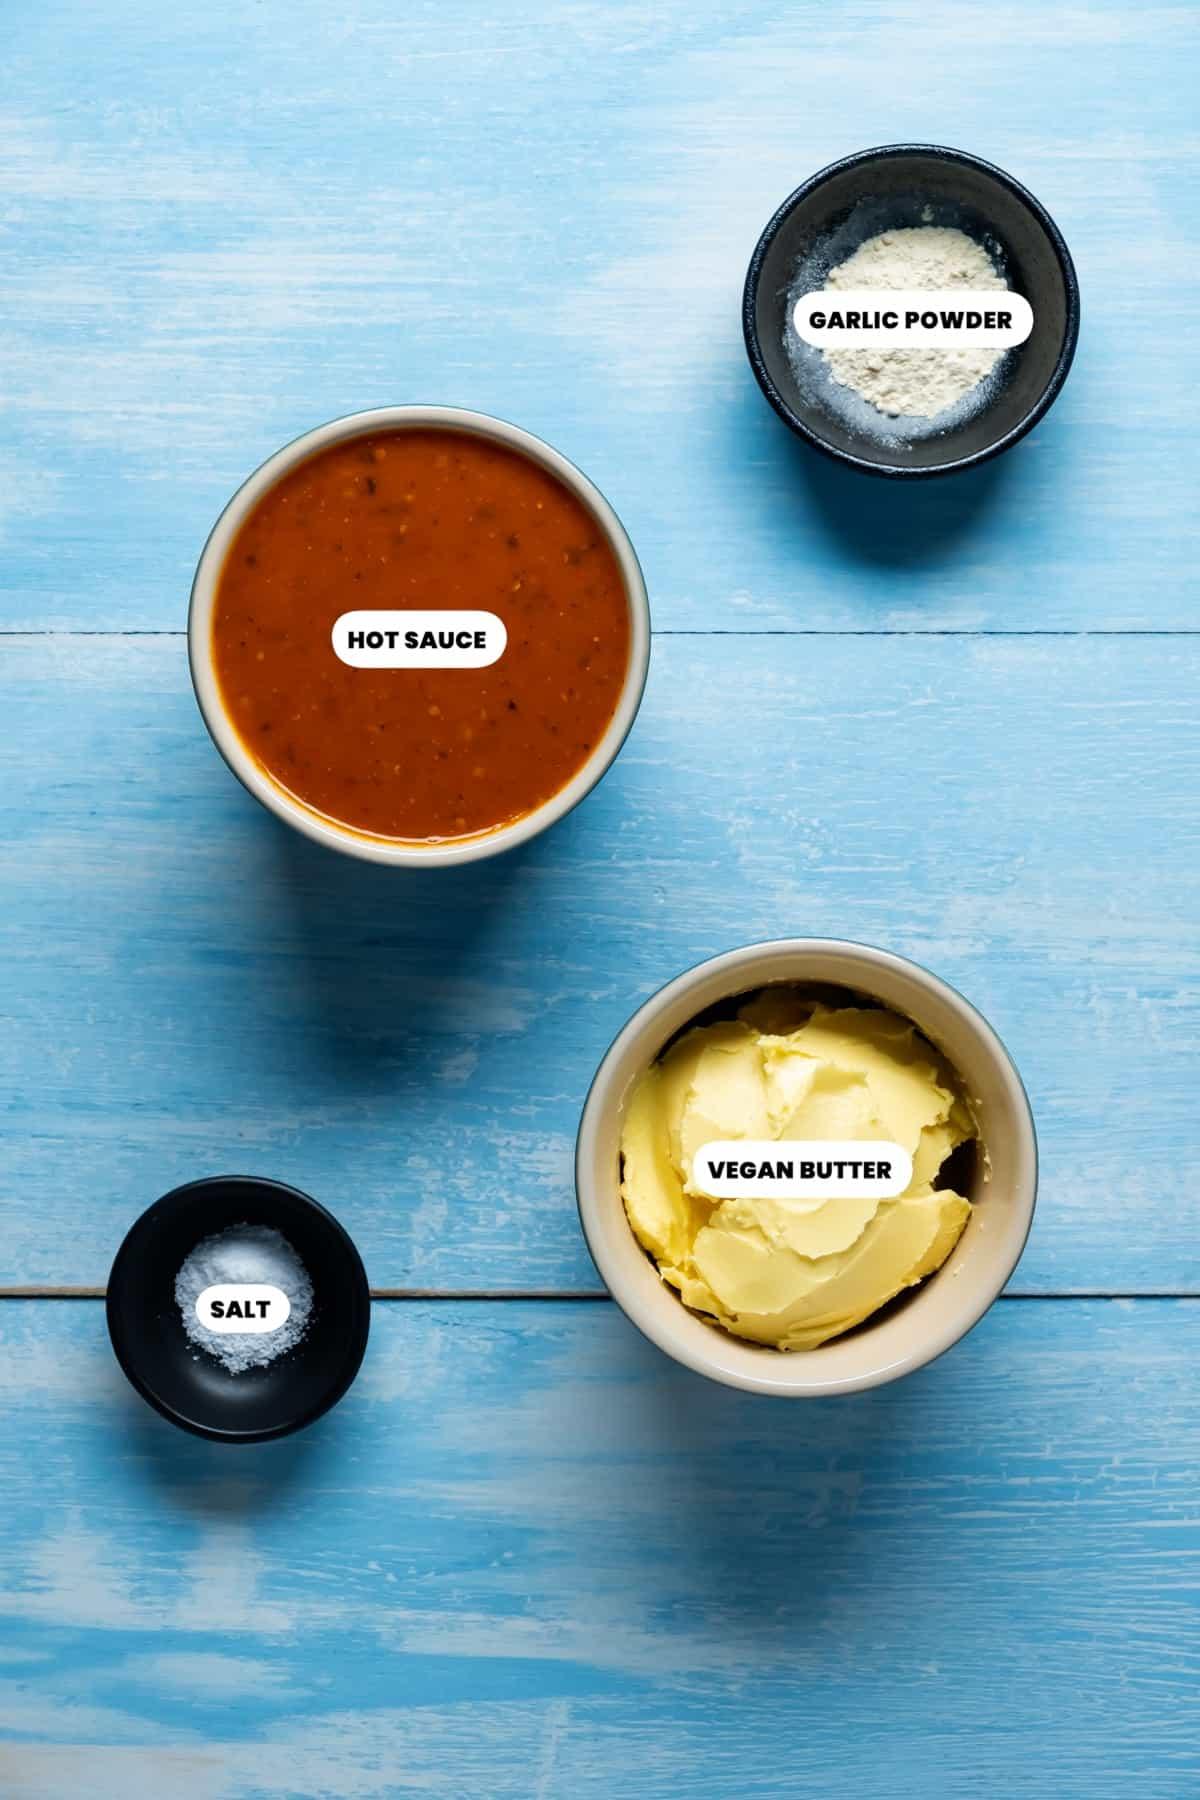 Photo of the ingredients needed to make vegan buffalo sauce.